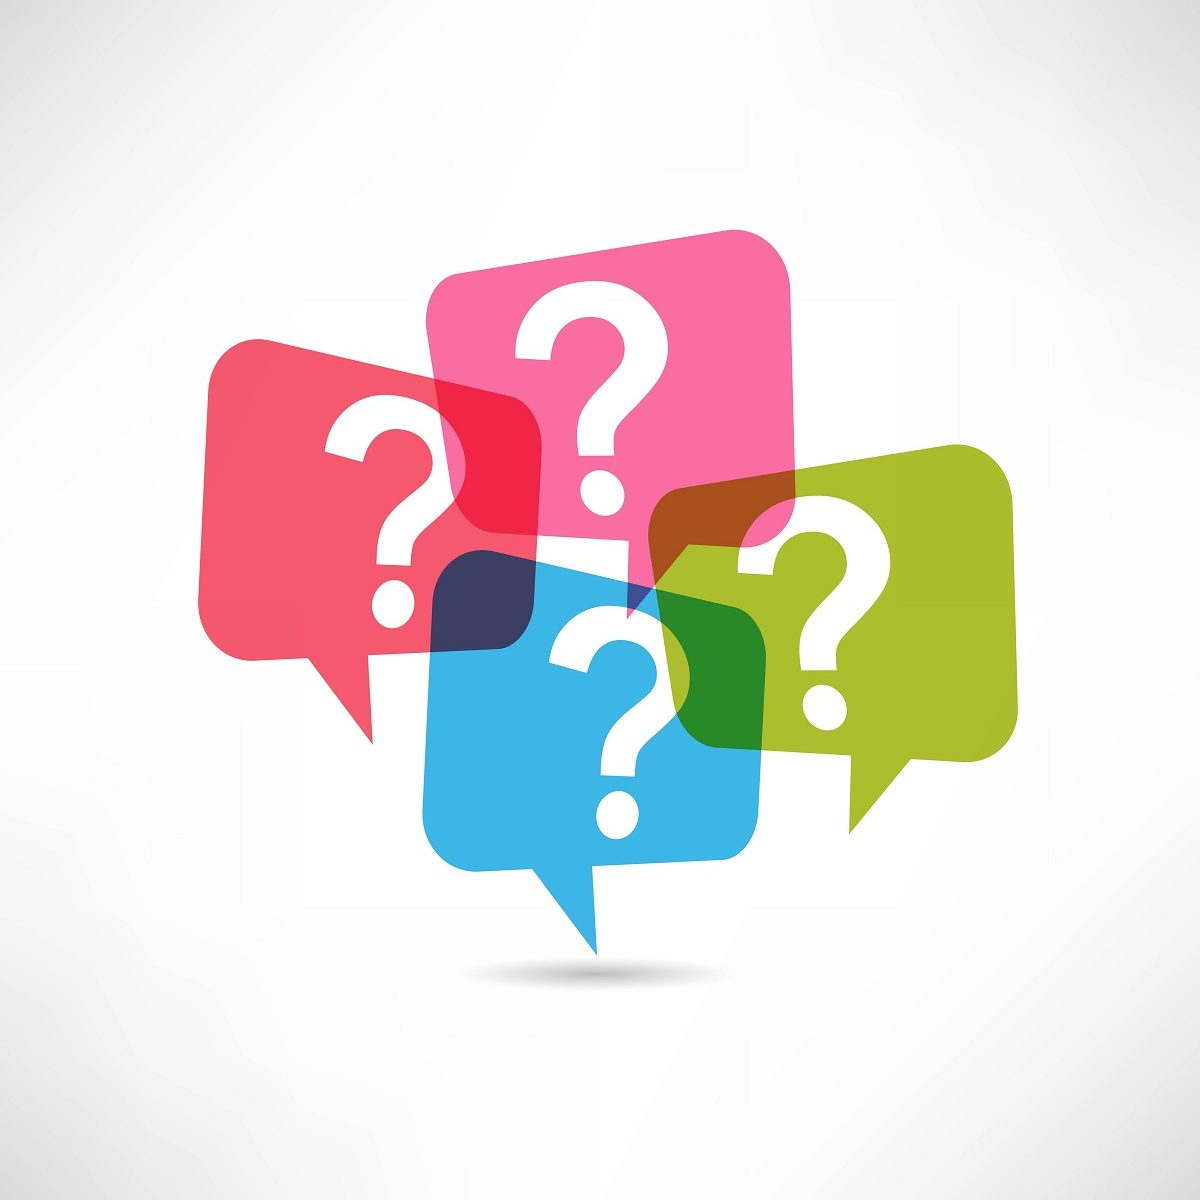 LASIK consultation questions